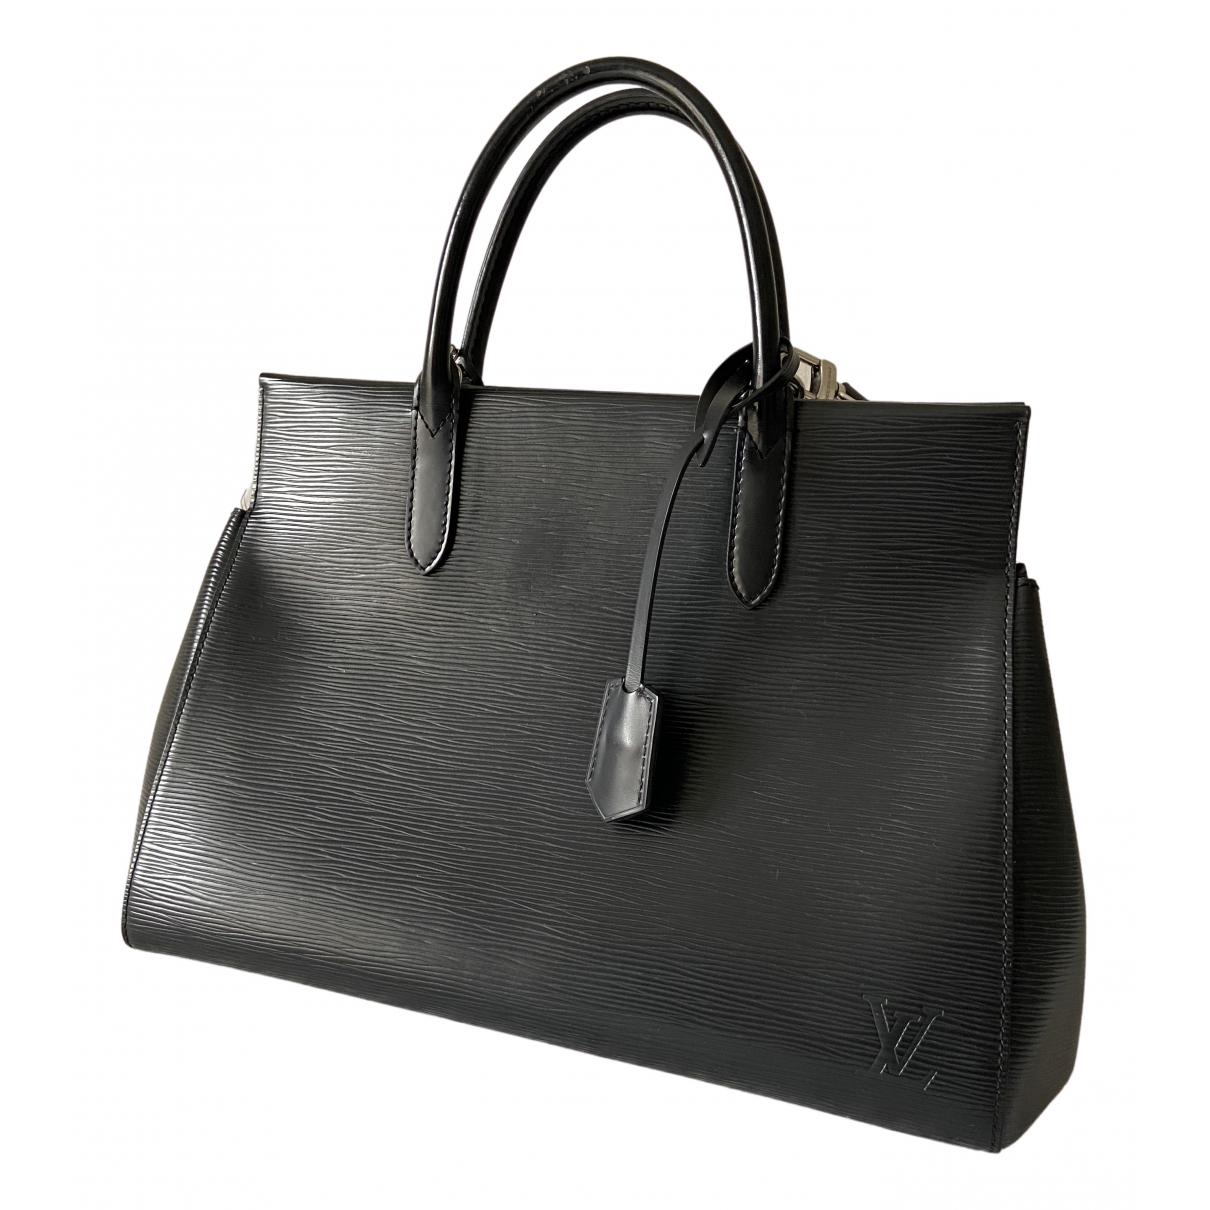 Louis Vuitton - Sac a main Marly pour femme en cuir - noir